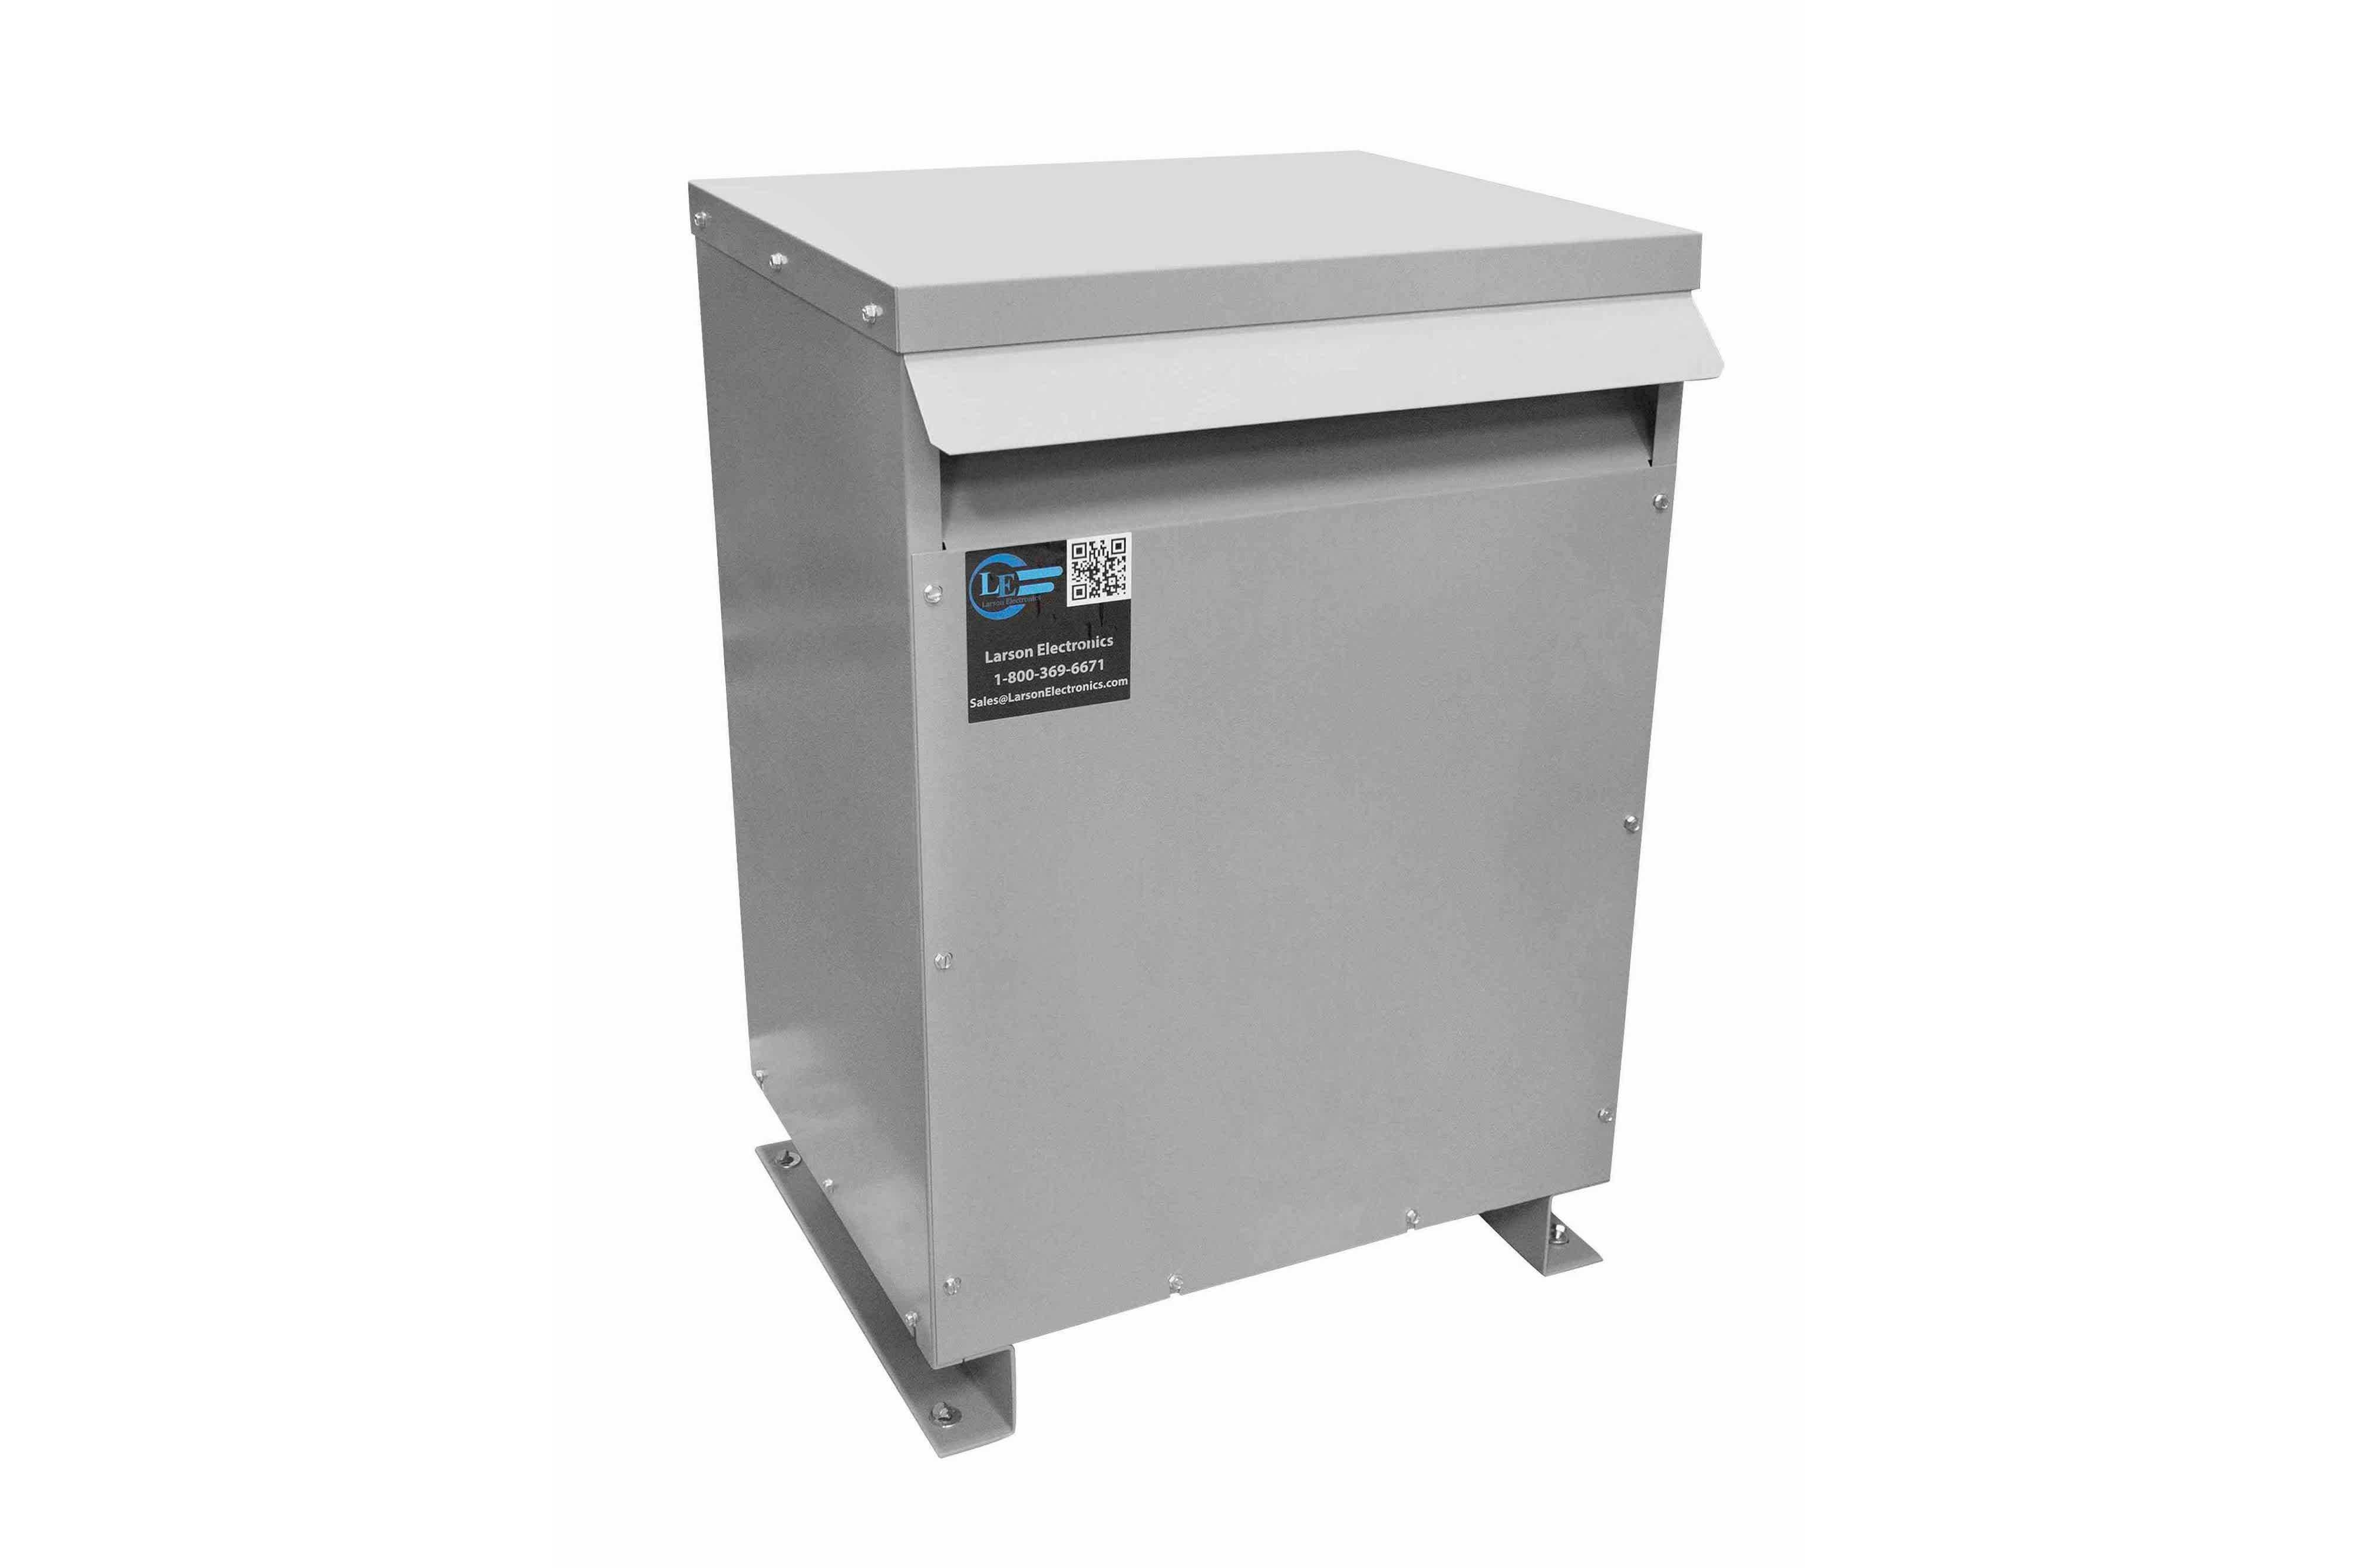 11 kVA 3PH Isolation Transformer, 380V Wye Primary, 480V Delta Secondary, N3R, Ventilated, 60 Hz